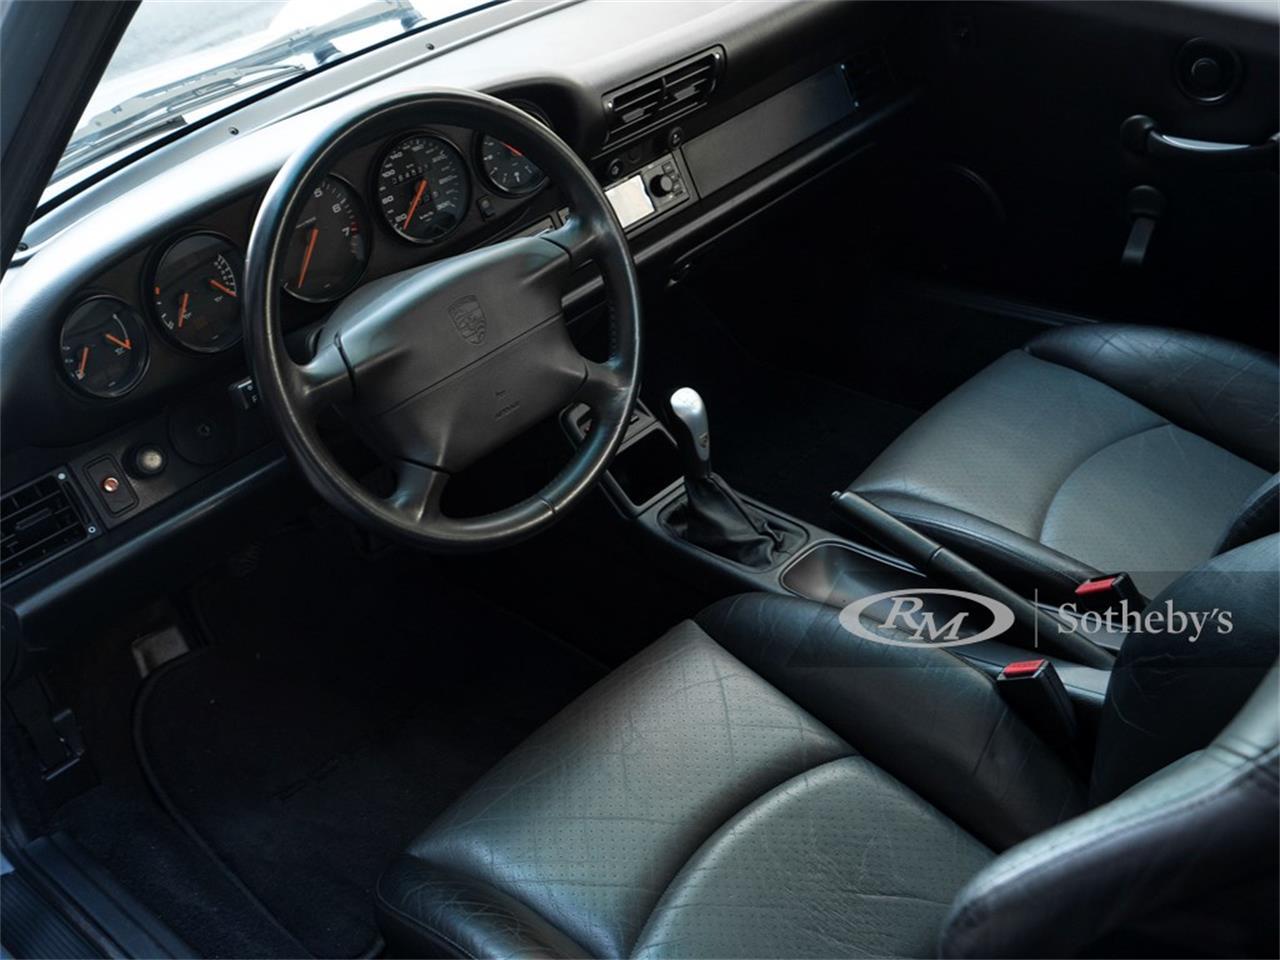 1995 Porsche 911 Carrera RS (CC-1415624) for sale in Hershey, Pennsylvania